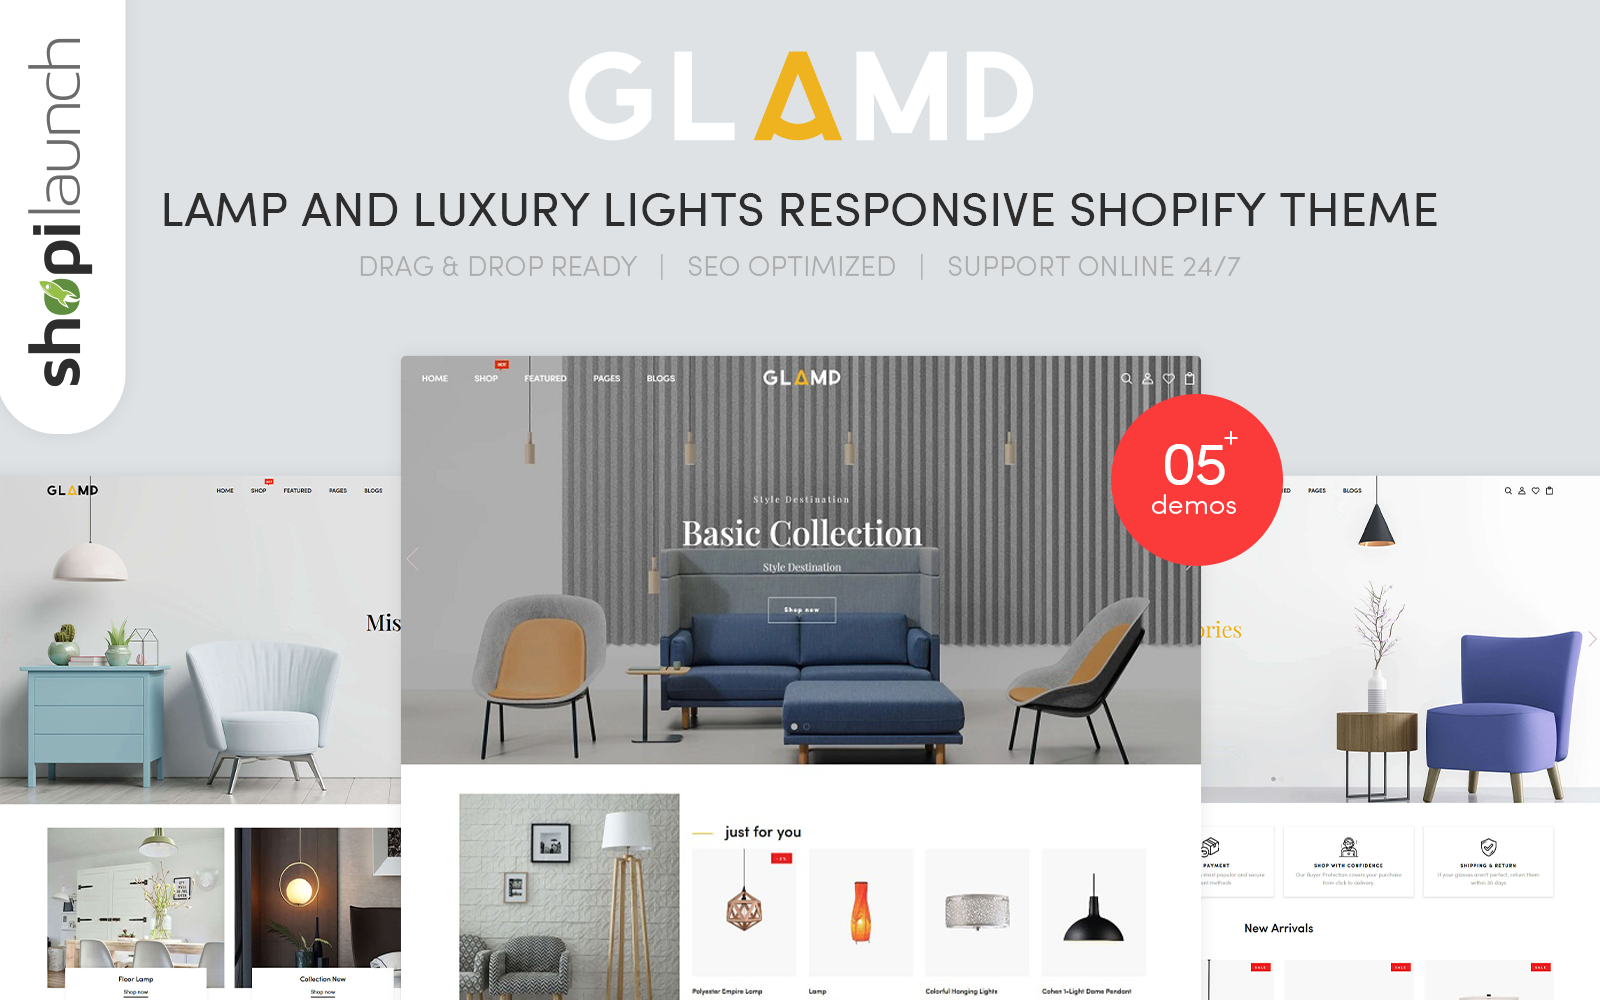 Glamp - Lamp & Luxury Lights Responsive Shopify Theme